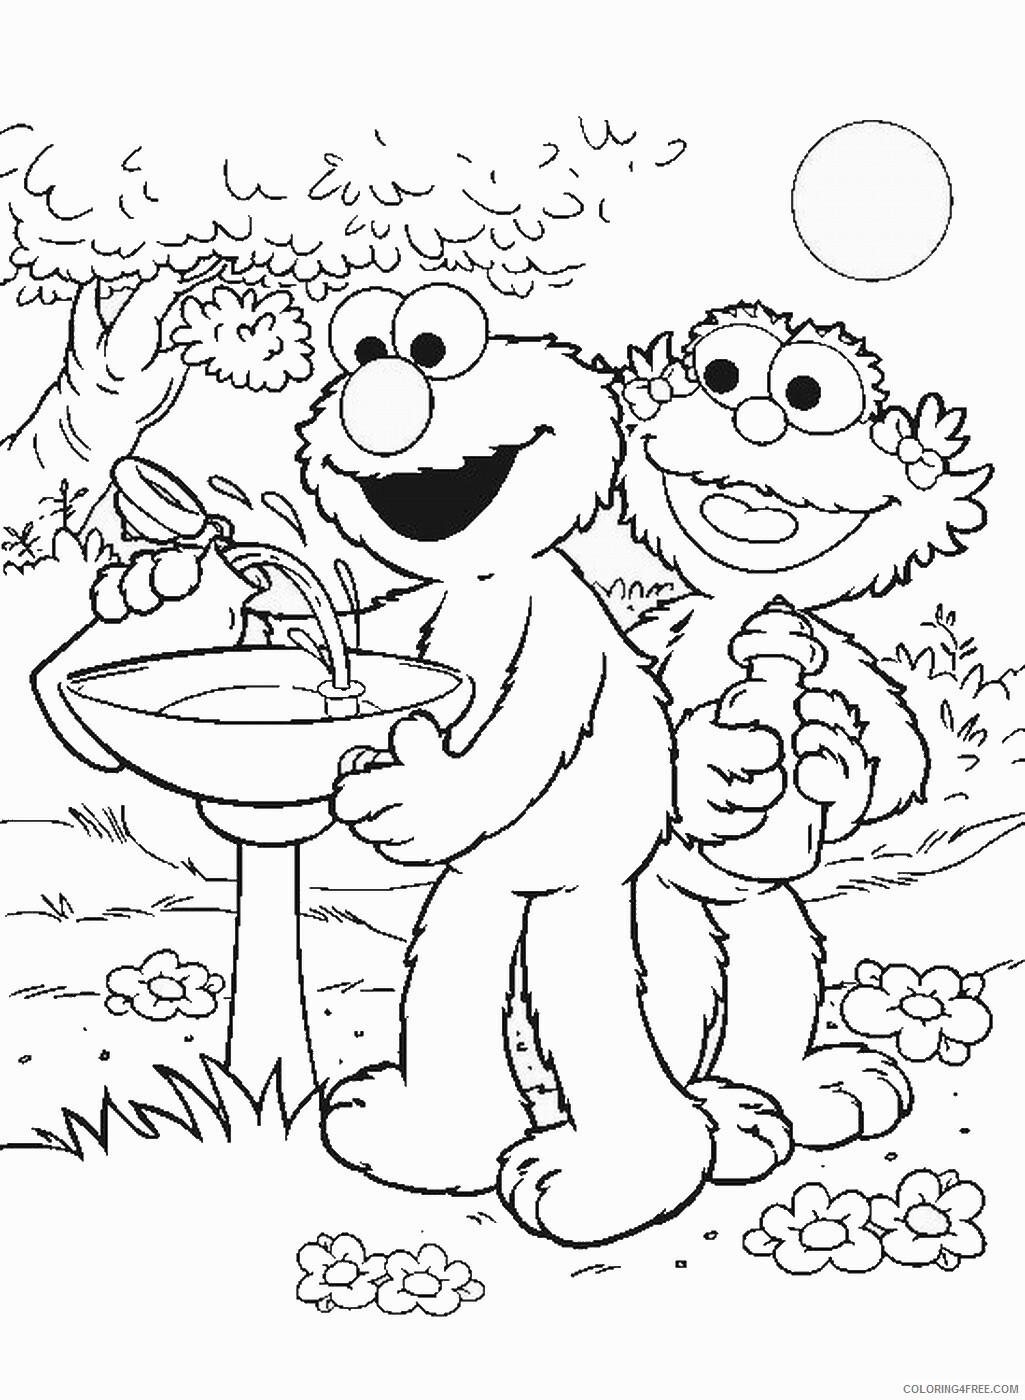 Sesame Street Coloring Pages TV Film sesame_12 Printable 2020 07369 Coloring4free